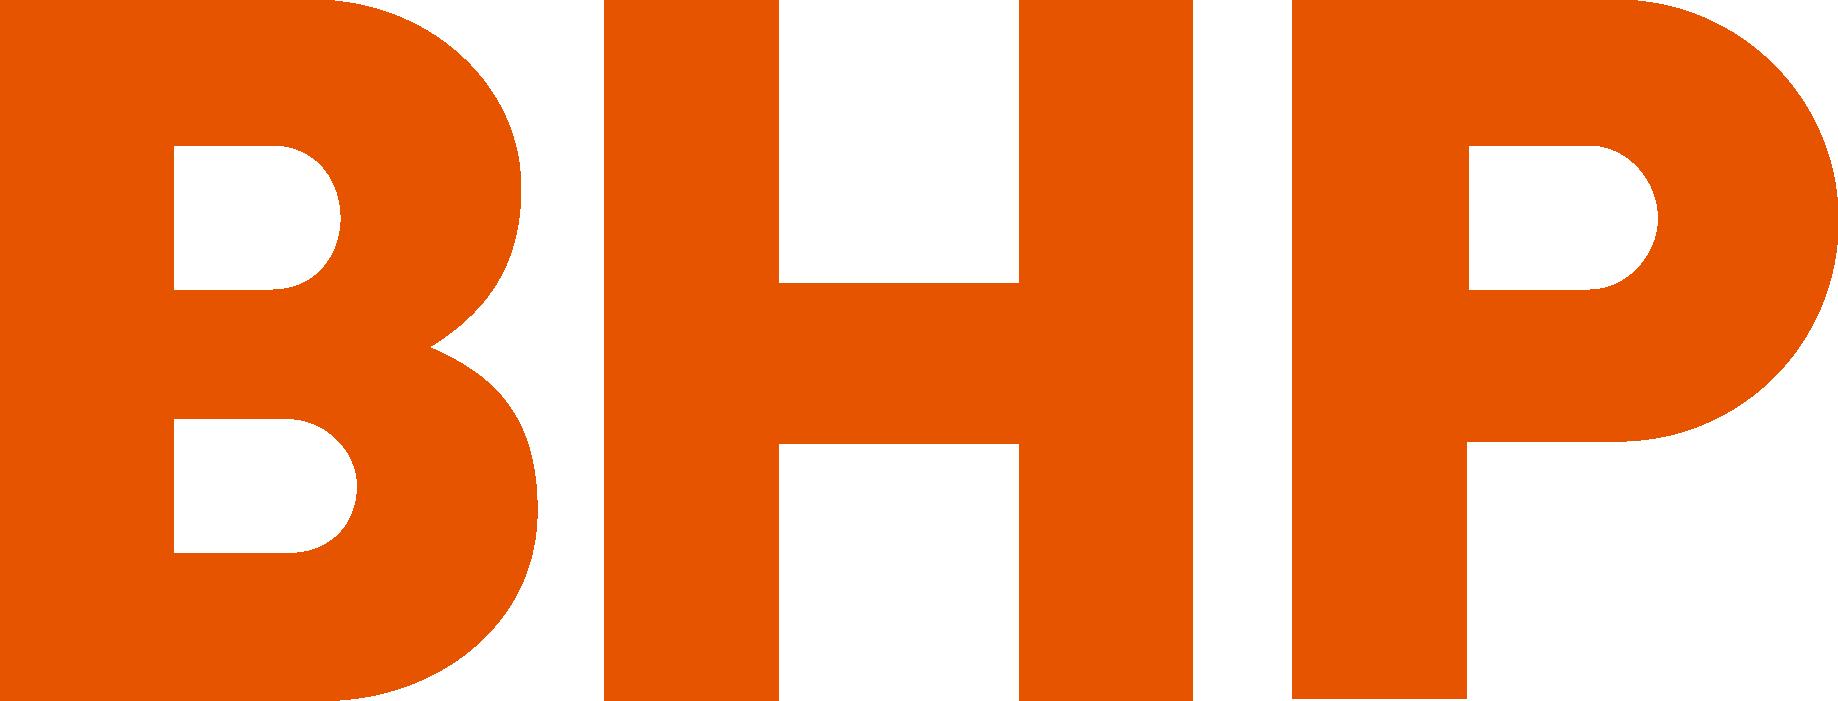 BHP Billiton Logo.